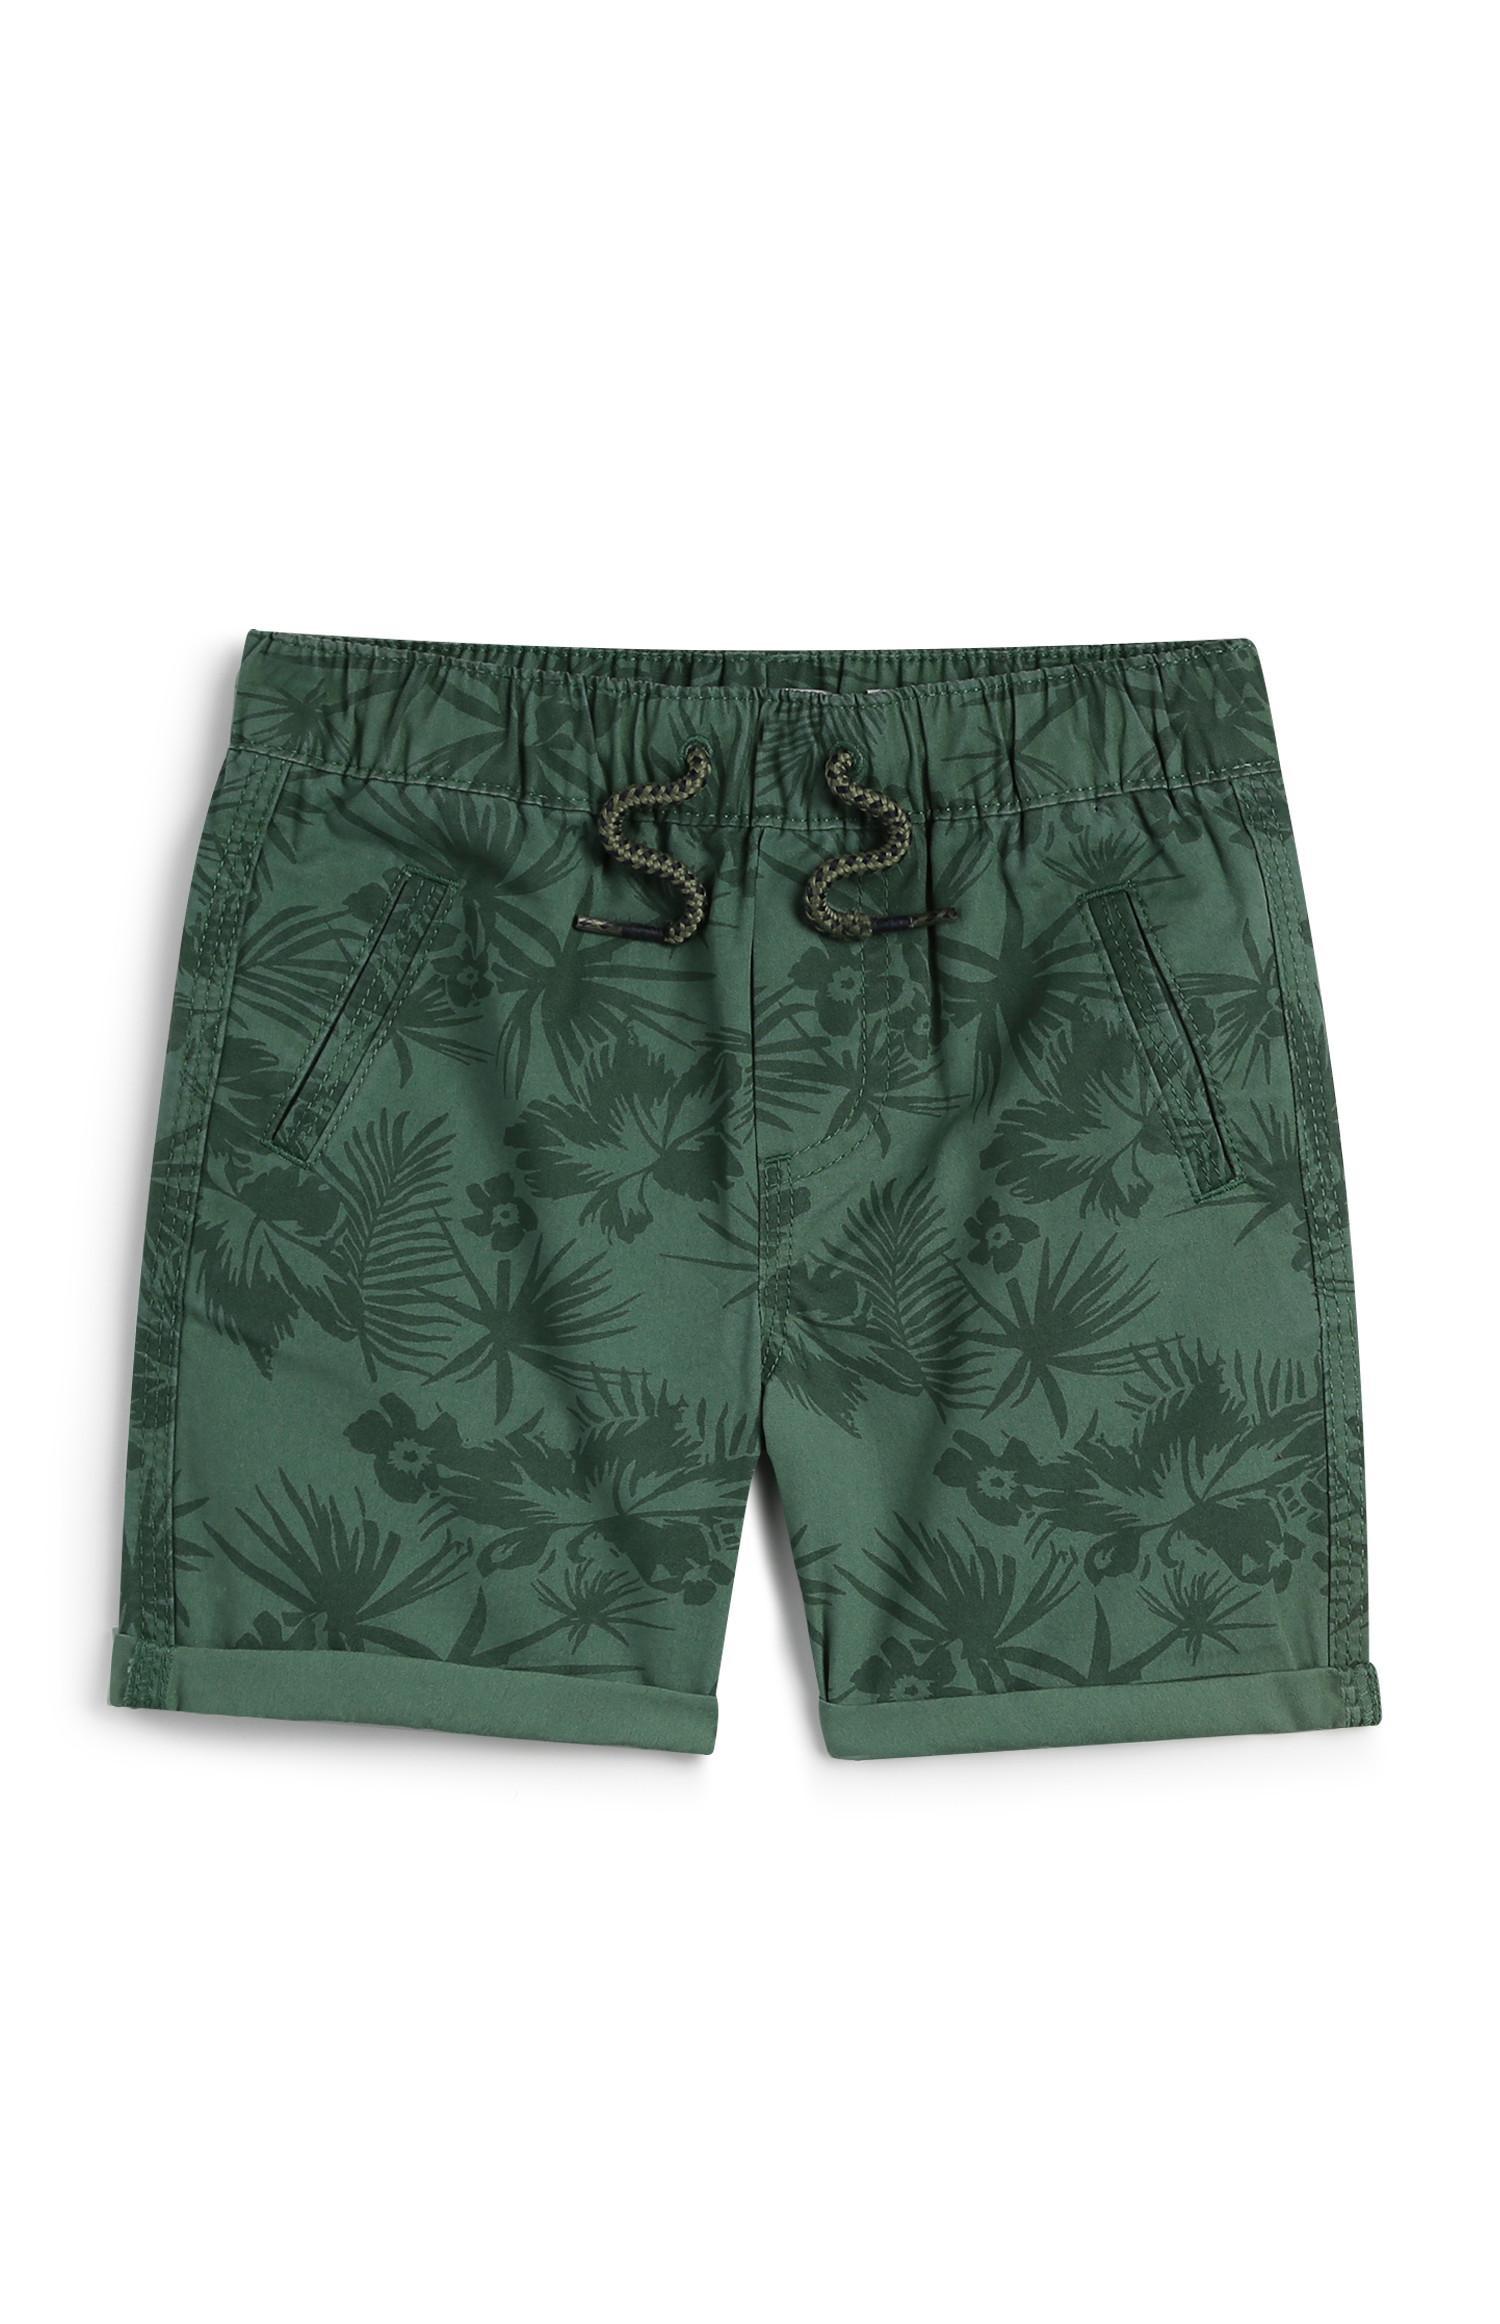 Younger Boy Palm Print Shorts